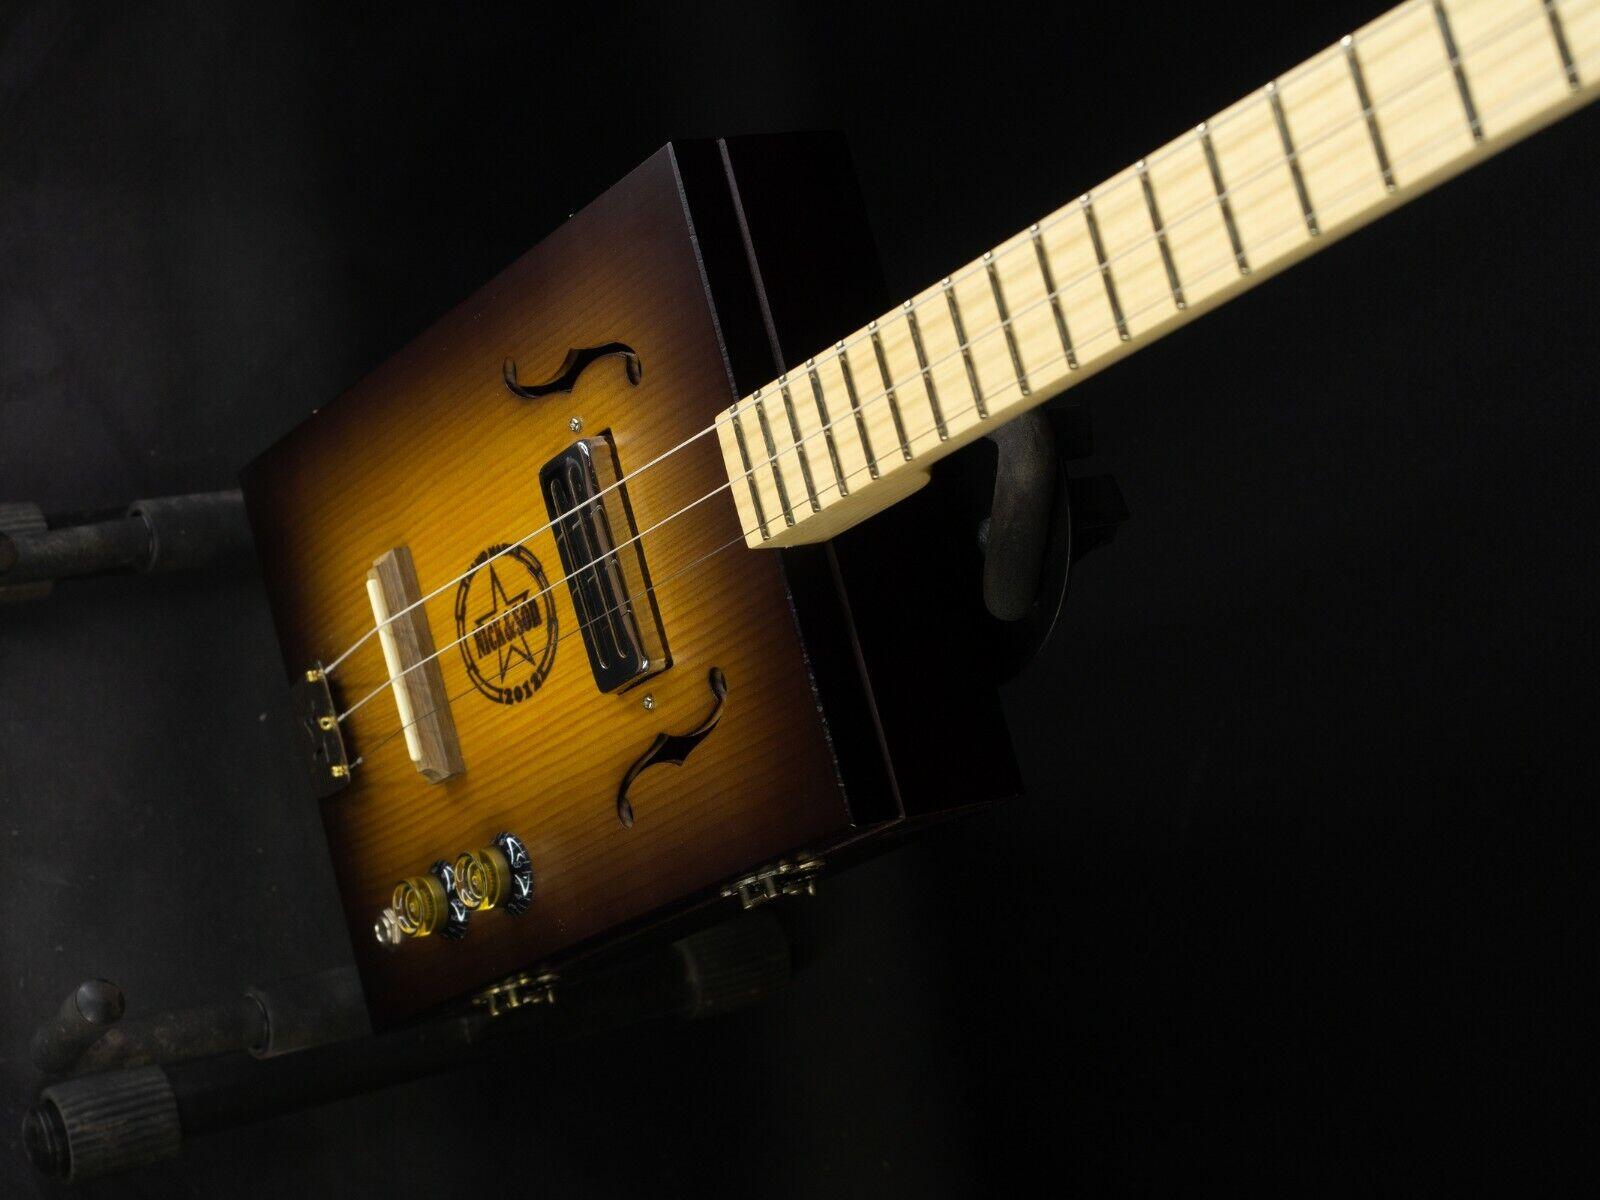 Cigar box guitar 3 string handmade